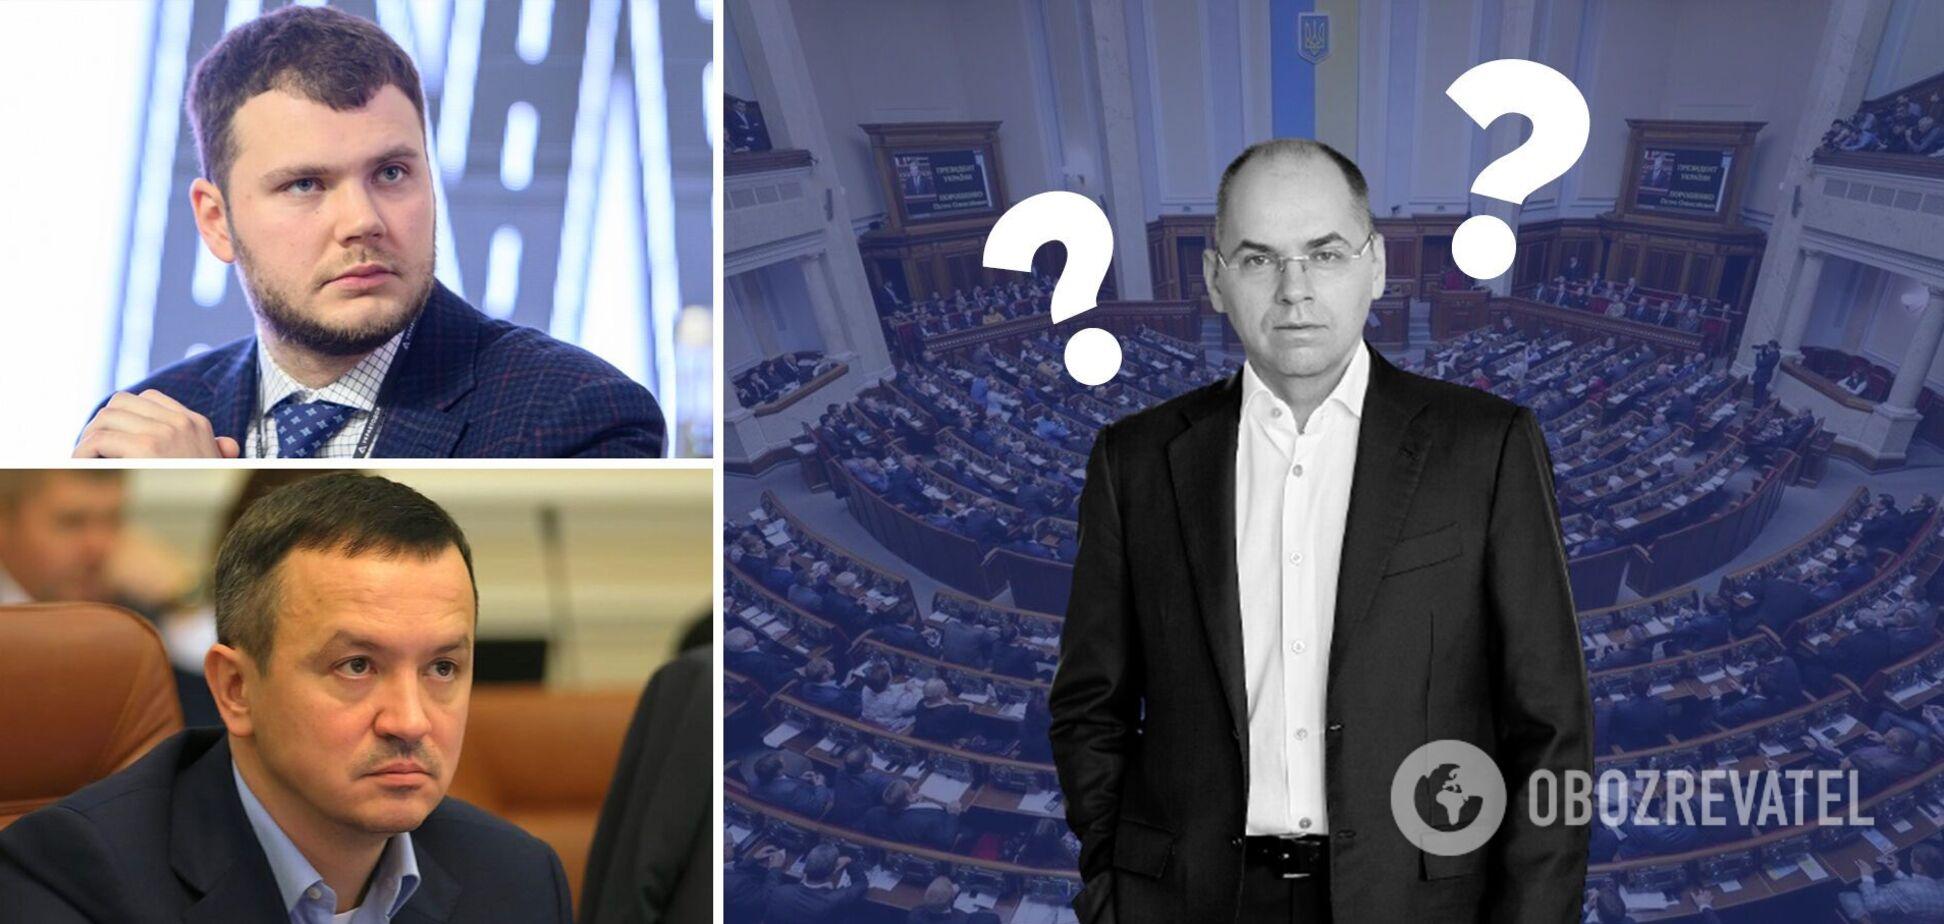 Криклия, Петрашко и Степанова хотят уволить